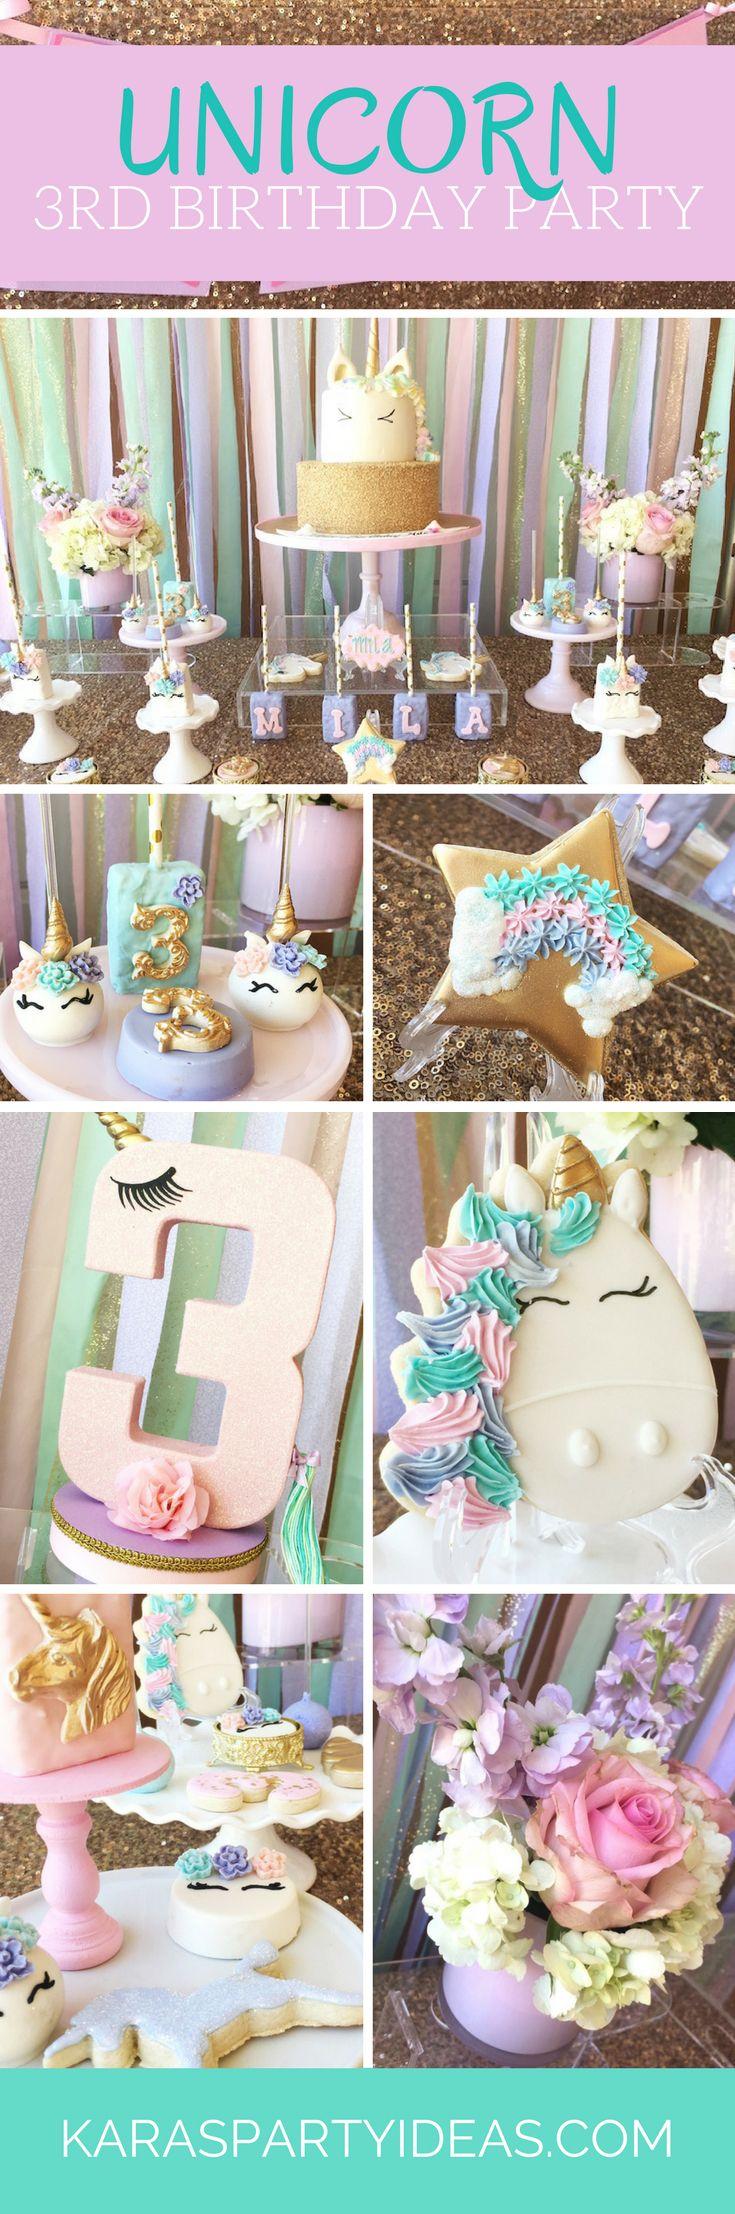 Unicorn 3rd Birthday Party Kara S Party Ideas Birthday Parties Unicorn Birthday Parties 3rd Birthday Parties